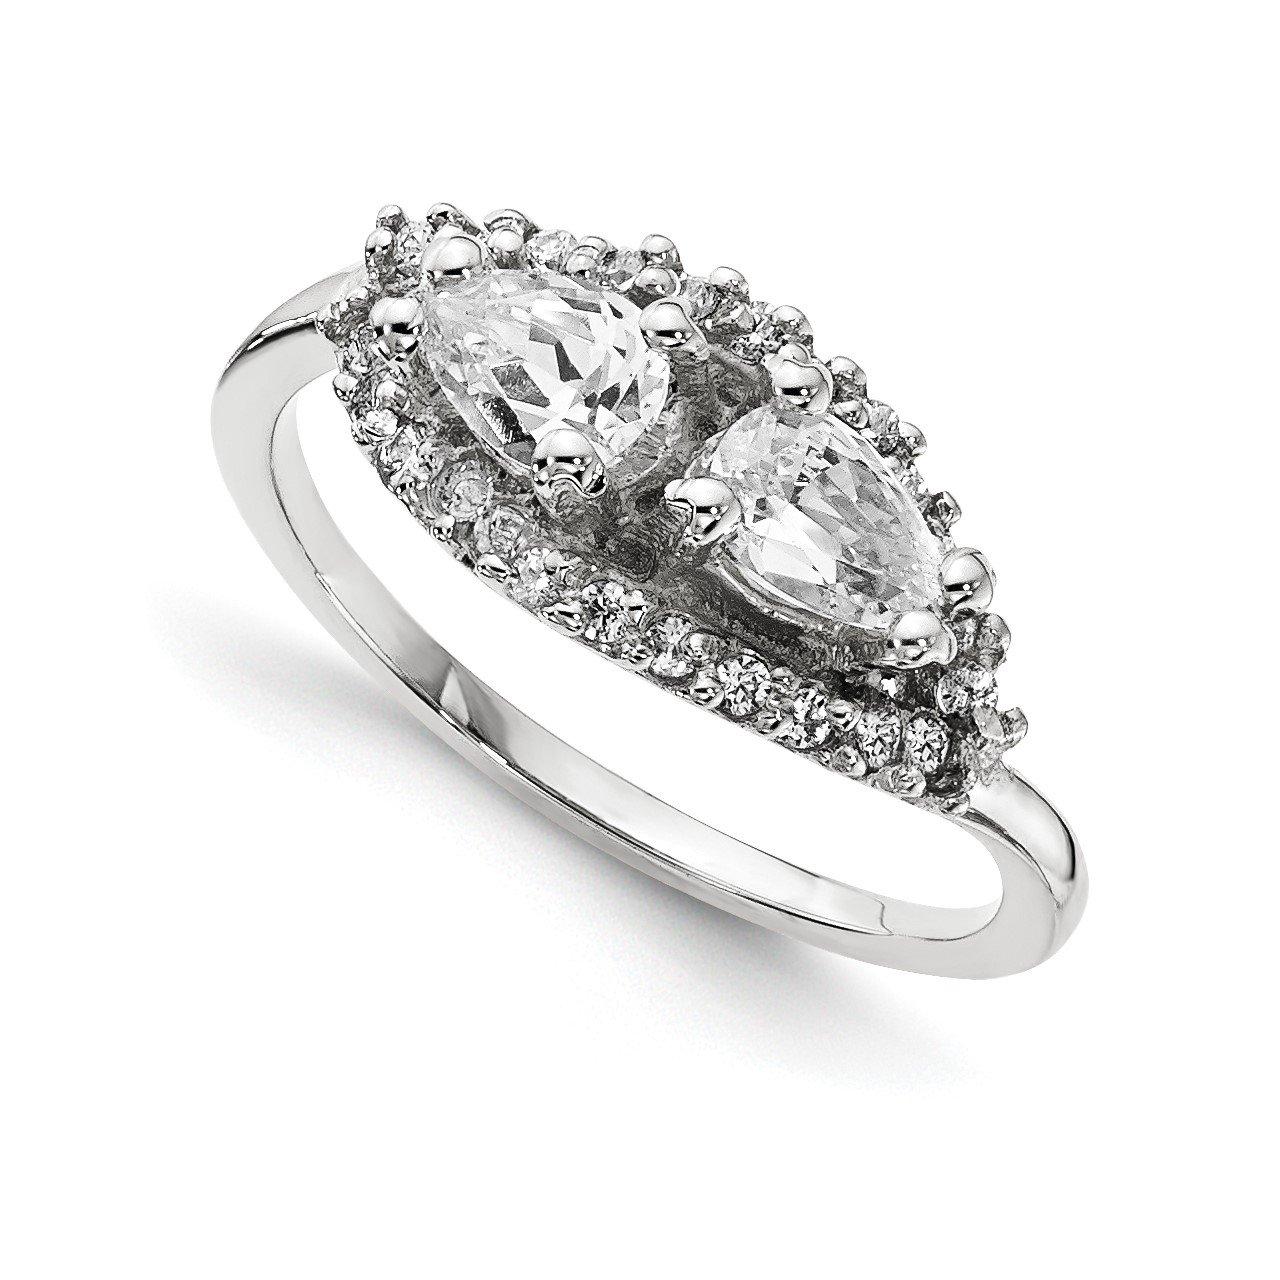 14KW AA Diamond 2-stone Ring Semi-Mount - 6x4 mm center stones